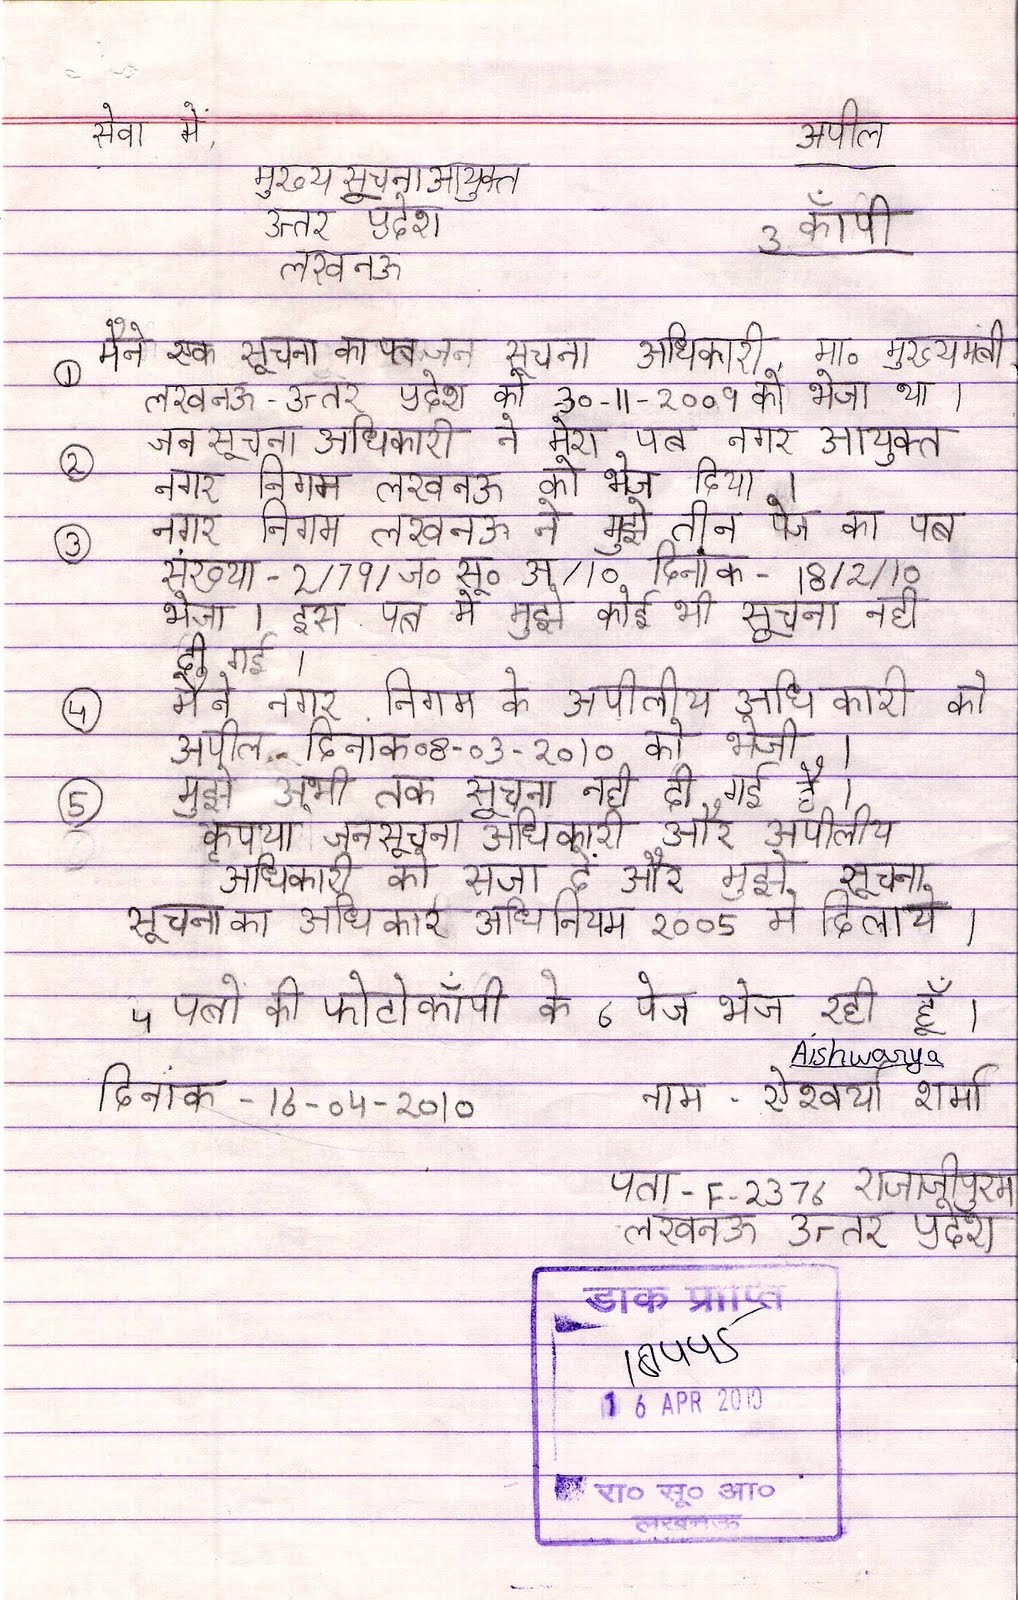 how to write rti application in telugu